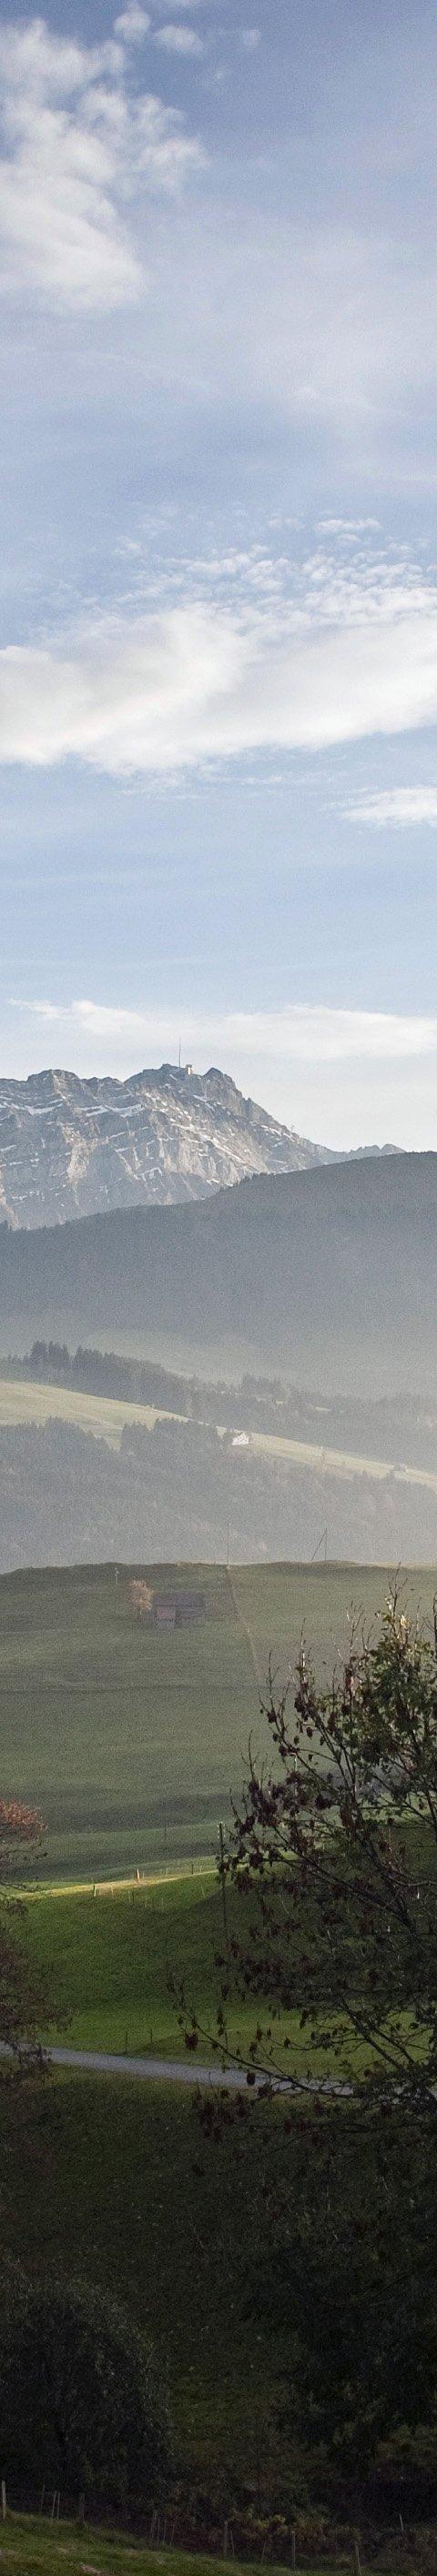 Säntis / Appenzeller Land - Foto 1